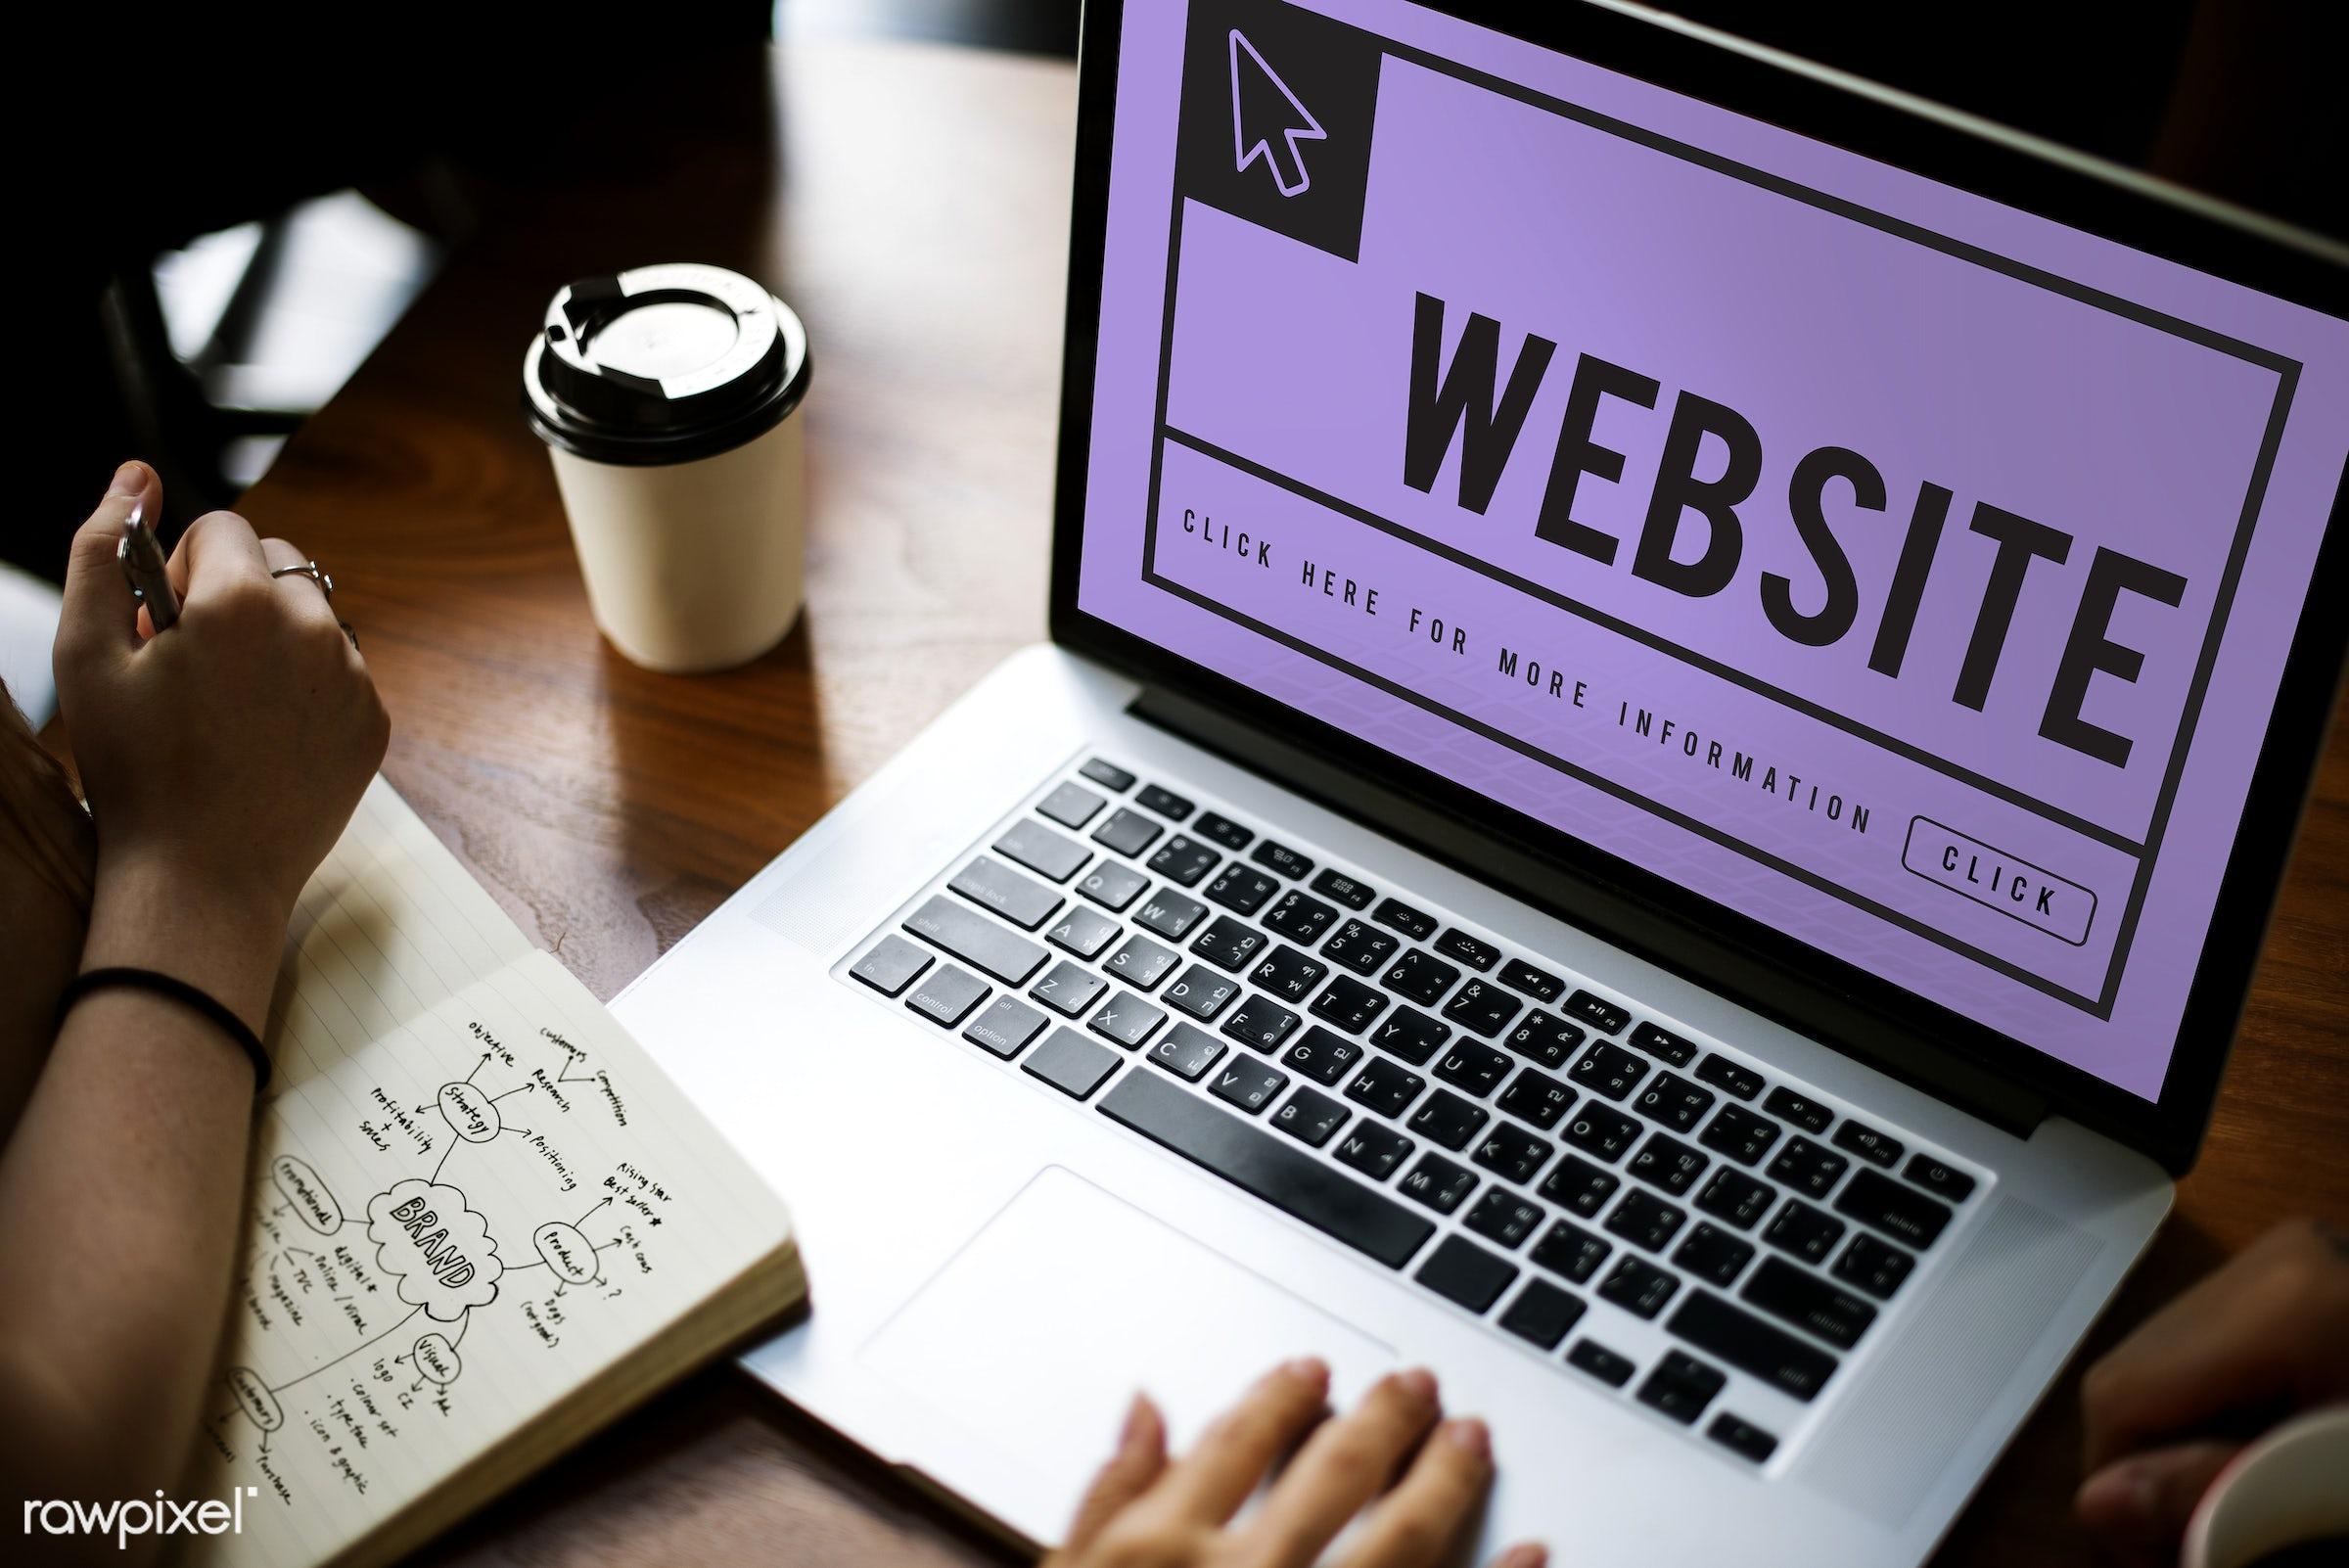 Online technology - laptop, website, click, pen, work, arrow, browsing, coffee cup, content, cursor, design, device, digital...